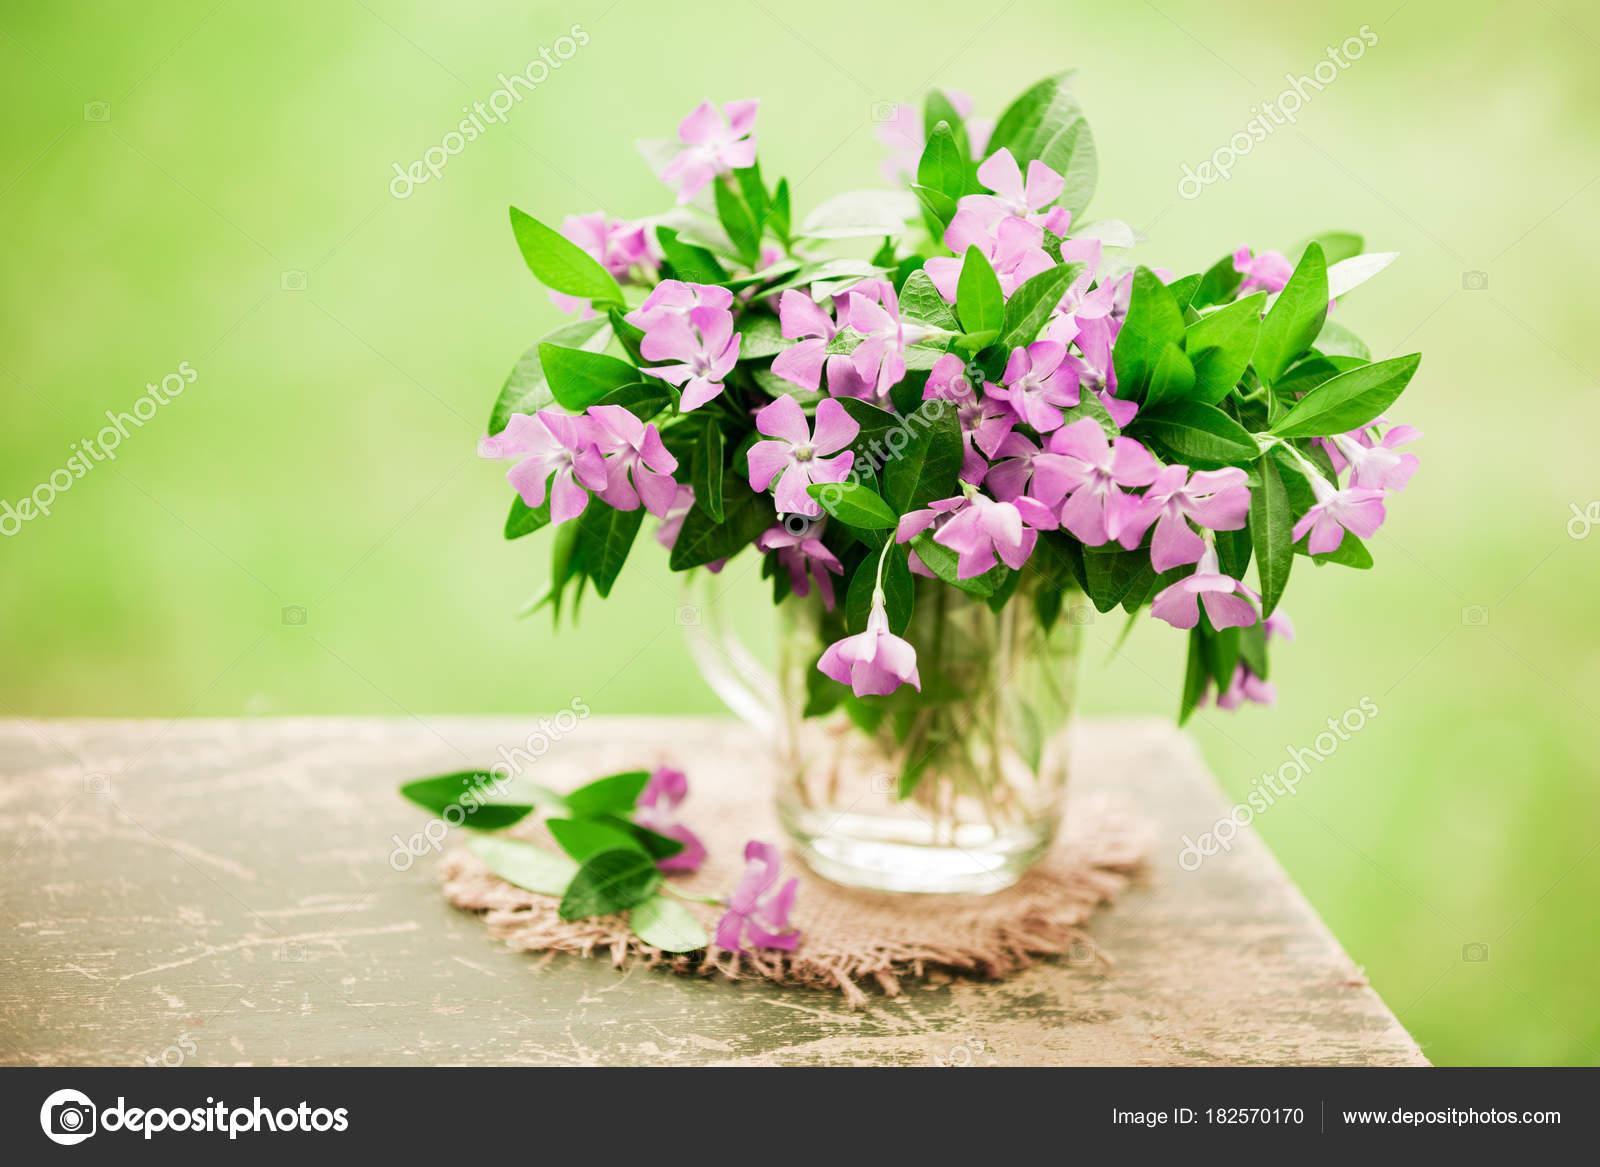 Vintage bouquet periwinkle flowers outdoor grunge wooden table green vintage bouquet periwinkle flowers outdoor grunge wooden table green blurred stock photo izmirmasajfo